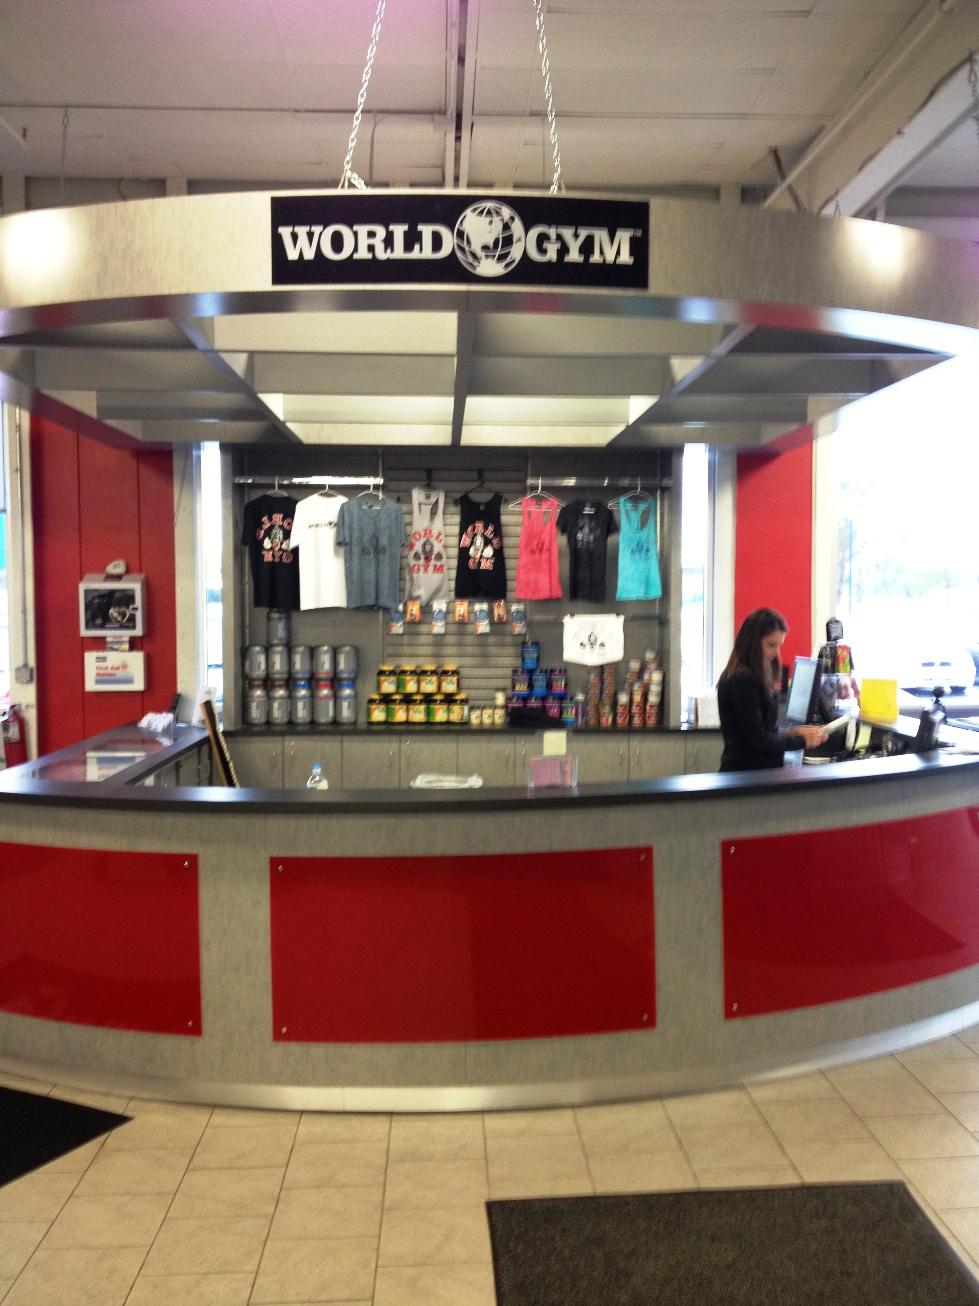 Fitness Center Reception Desk for World Gym  Creative